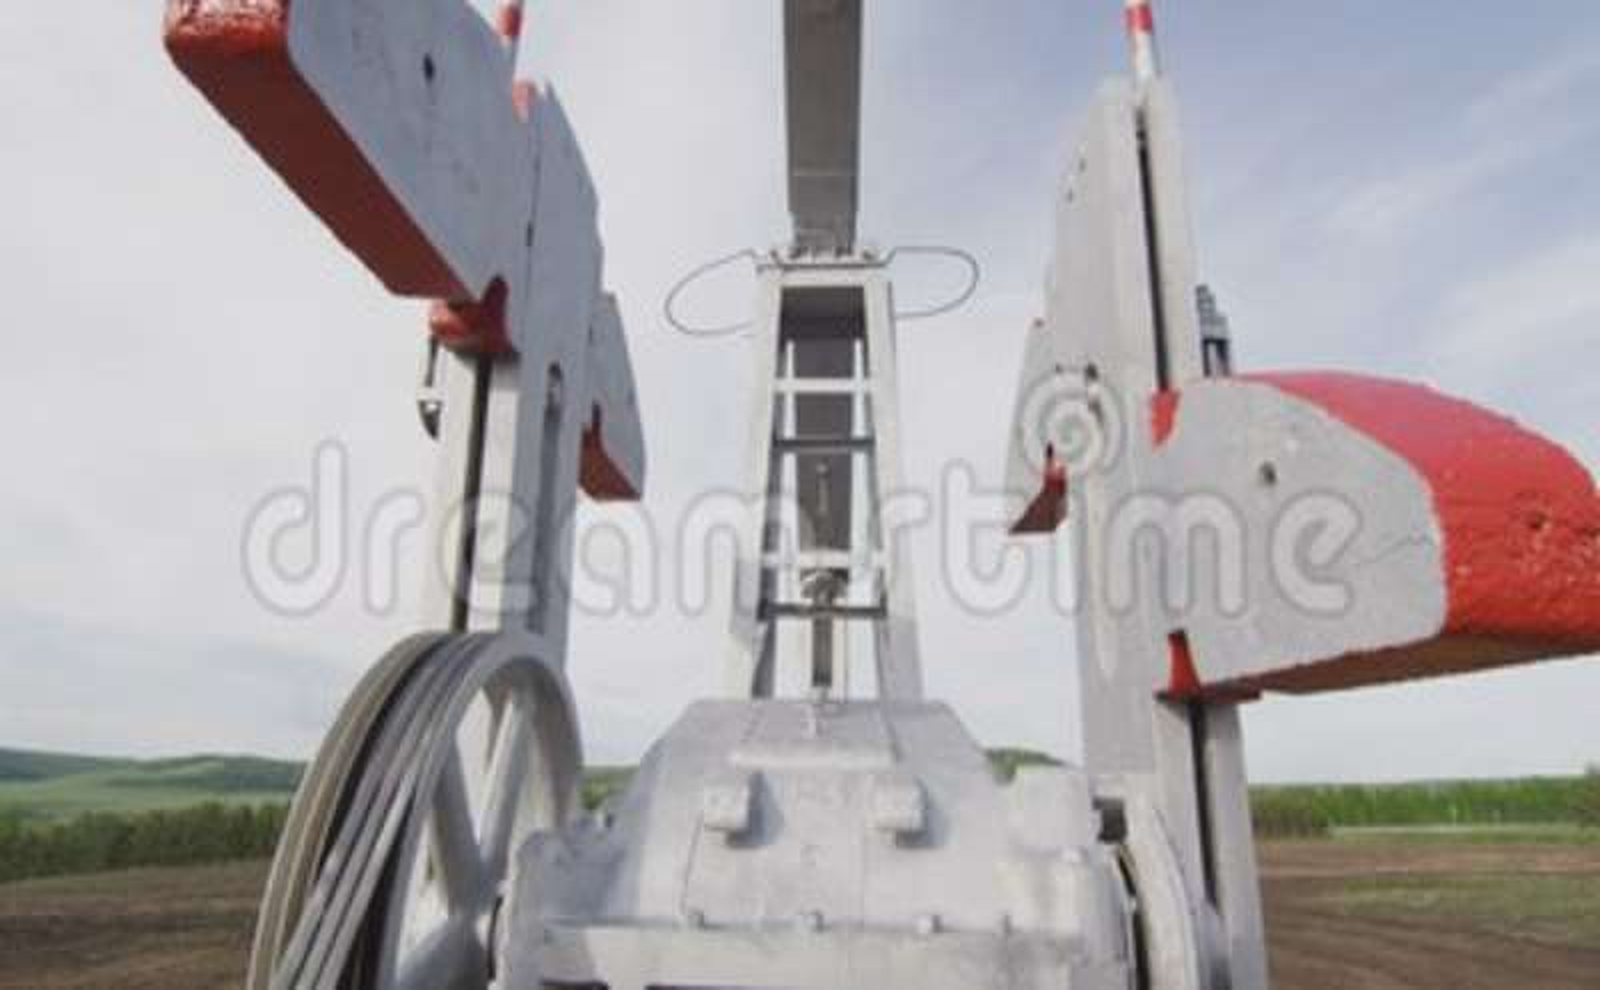 Pump Jack Moving Metal Parts at Oil Well Closeup